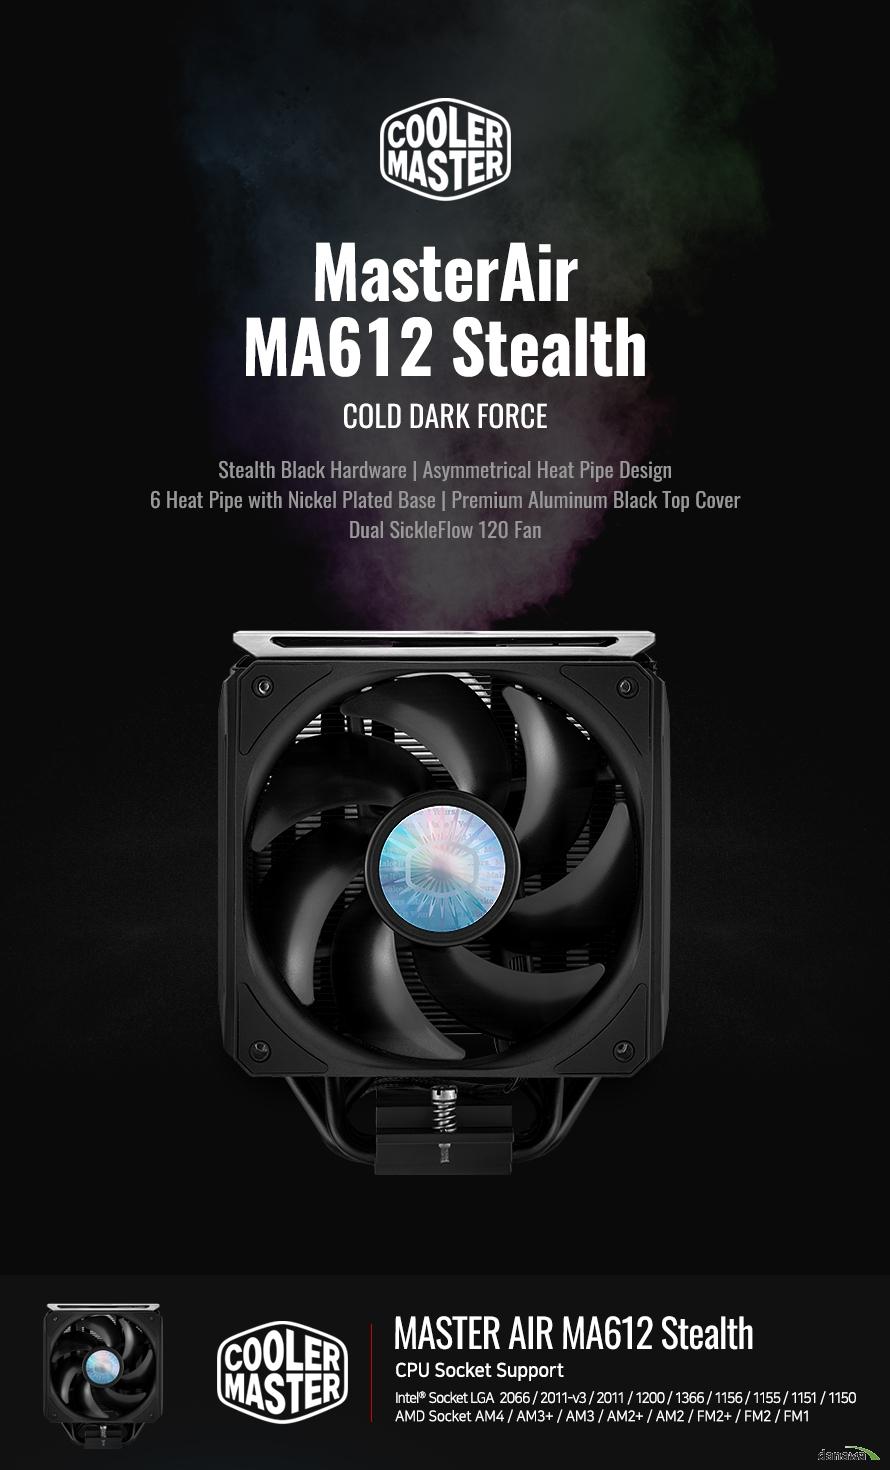 MasterAir MA612 Stealth COLD DARK FORCE Stealth Black Hardware | Asymmetrical Heat Pipe Design 6 Heat Pipe with Nickel Plated Base | Premium Aluminum Black Top Cover Dual SickleFlow 120 Fan   MASTER AIR MA612 Stealth CPU Socket Support Intel® Socket LGA  2066 / 2011-v3 / 2011 / 1200 / 1366 / 1156 / 1155 / 1151 / 1150 AMD Socket AM4 / AM3+ / AM3 / AM2+ / AM2 / FM2+ / FM2 / FM1    인텔® 10세대 및 AMD 4세대 라이젠TM, 최신 프로세서를 완벽하게 호환합니다.MA612 Stealth는 INTEL LGA1200 소켓과 AMD AM4 소켓을 모두 지원합니다.  Dual FAN,  optimizes airflow With SickleFlow 120 Fan 두 개의 곡선형 블레이드를 장착한 SicleFlow Fan는 공기의 흐름을 최적화하여 손 쉽게 냉각하여 열을 제거합니다.  Black aluminum top cover With offers a premium finish 쿨러마스터만의 프리미엄 블랙 알루미늄으로 제작된 커버는 세련된 디자인을 완성합니다.  Copper Heatpipe x6 6개의 히트파이프와 니켈 도금 된 구리베이스에 프리미엄 블랙 알루미늄 마감으로 더욱 빠르게 발열을 제거할 수 있습니다.  SickleFlow 120 Fans  120mm 쿨링팬은 높은 풍압, 낮은 소음, 긴 수명을 자랑하는 Cooler Master의 팬으로 뛰어난 성능을 갖추었습니다.  SILENT COOLING TECHNOLOGY 고성능 저소음 쿨링팬 적용 SickleFlow 120 쿨링팬은 소음을 획기적으로 감소시키는 IC기술이 적용된 사일런트 드라이버를 장착하여 낮은 소음 으로 최고의 쿨링 성능을 제공합니다. 헬리콥터에서 영감을 받은 팬 블레이드 형태는 최고의 성능을 자랑합니다.  프리미엄 블랙 알루미늄 탑 커버 블랙 팬과 히트싱크가 매치된 블랙 알루미늄으로 제작된 커버는 세련된 디자인을 완성합니다.  두 개의 곡선형 블레이드 장착 SickleFlow 팬은 공기의 흐름을 최적화하여 손 쉽게 냉각하여 열을 제거합니다.   니켈 도금 베이스로 제작된 6개의 히트 파이프 6개의 히트파이프와 니켈 도금 된 구리베이스는 최적의 냉각 성능을 제공합니다.   비대칭 히트 파이프 설계 비대칭 히트 파이프 설계는 RAM 호환성과 여유 공간을 제공합니다.   저소음 고효율 강력한 쿨링 성능 강력한 쿨러 성능과 더불어 낮은 소음으로 최고의 쿨링 성능을 제공합니다.    MasterAir MA612 Stealth  CPU Socket Intel® Socket LGA 2066/2011-v3 / 2011 /1200/ 1366 / 1156/ 1155/ 1151/ 1150 AMD® Socket  AM4 / AM3+ / AM3 / AM2+ / AM2 / FM2+ / FM2 / FM1  Exterior Color Black Dimensions 129 x 112.2 x 158mm ( 5 x 4.4 x 6.2 inch) Heatsink Material 6 Heat pipes / Aluminum Fins Fan Dimensions 120(L) x 120(W) x 25(H) mm (4.7 x 4.7 x 1 inch) Fan Speed 650 - 1,800 RPM ± 5% Fan Air Flow 62 CFM(Max.) Fan Air Pressure 2.52mm H2O(Max.) Fan MTTF  160,000 hours Noise Level 8 - 27 dBA Connector 4 PIN (PWM) Rated Voltage 12 VDC Rated Current 0.15 A Safety Current 0.37A Power Consumption 1.8 W Warranty 5 Y